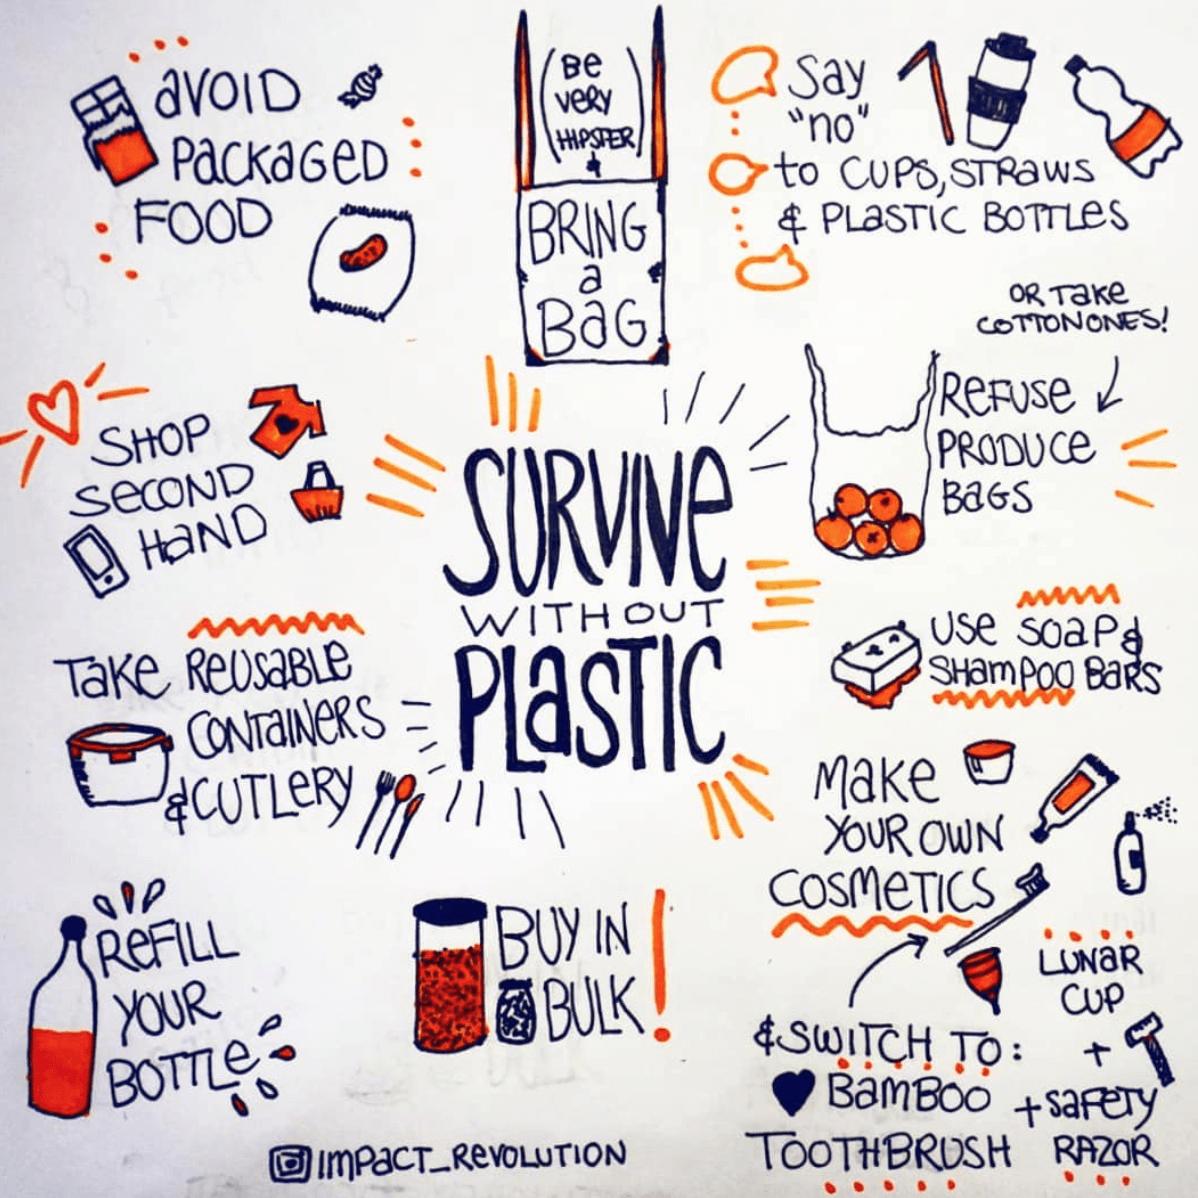 Ohne Plastik leben - Impactrevolution - baumfrei.de - Artikelbild 4